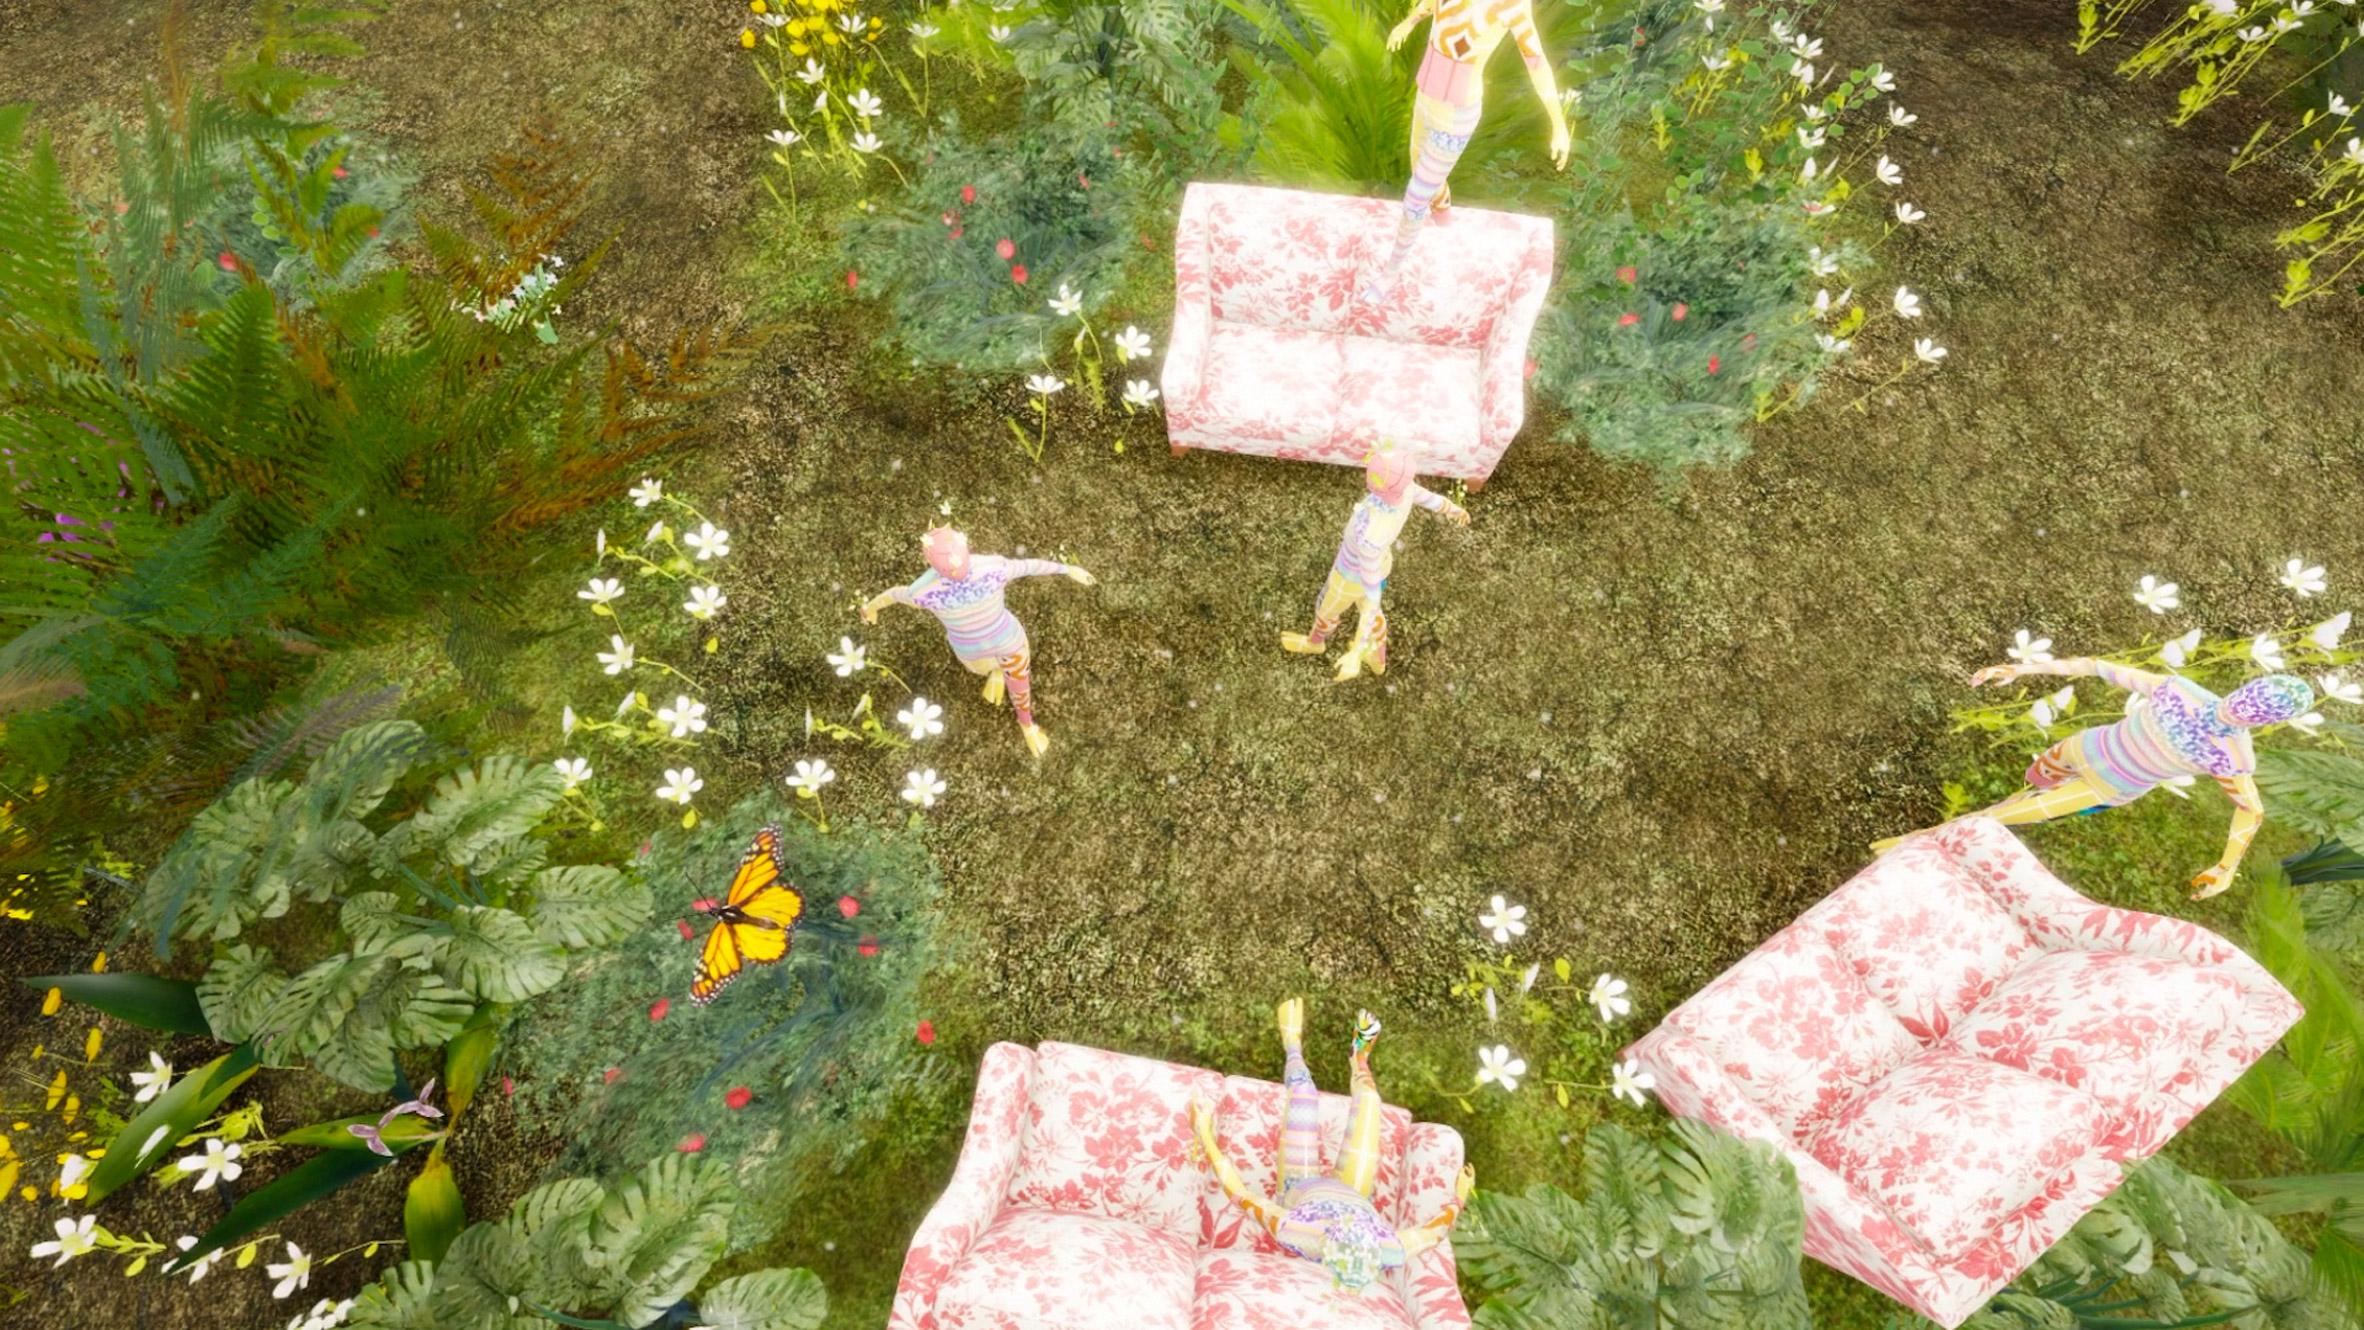 Gucci Garden virtual exhibition in Roblox